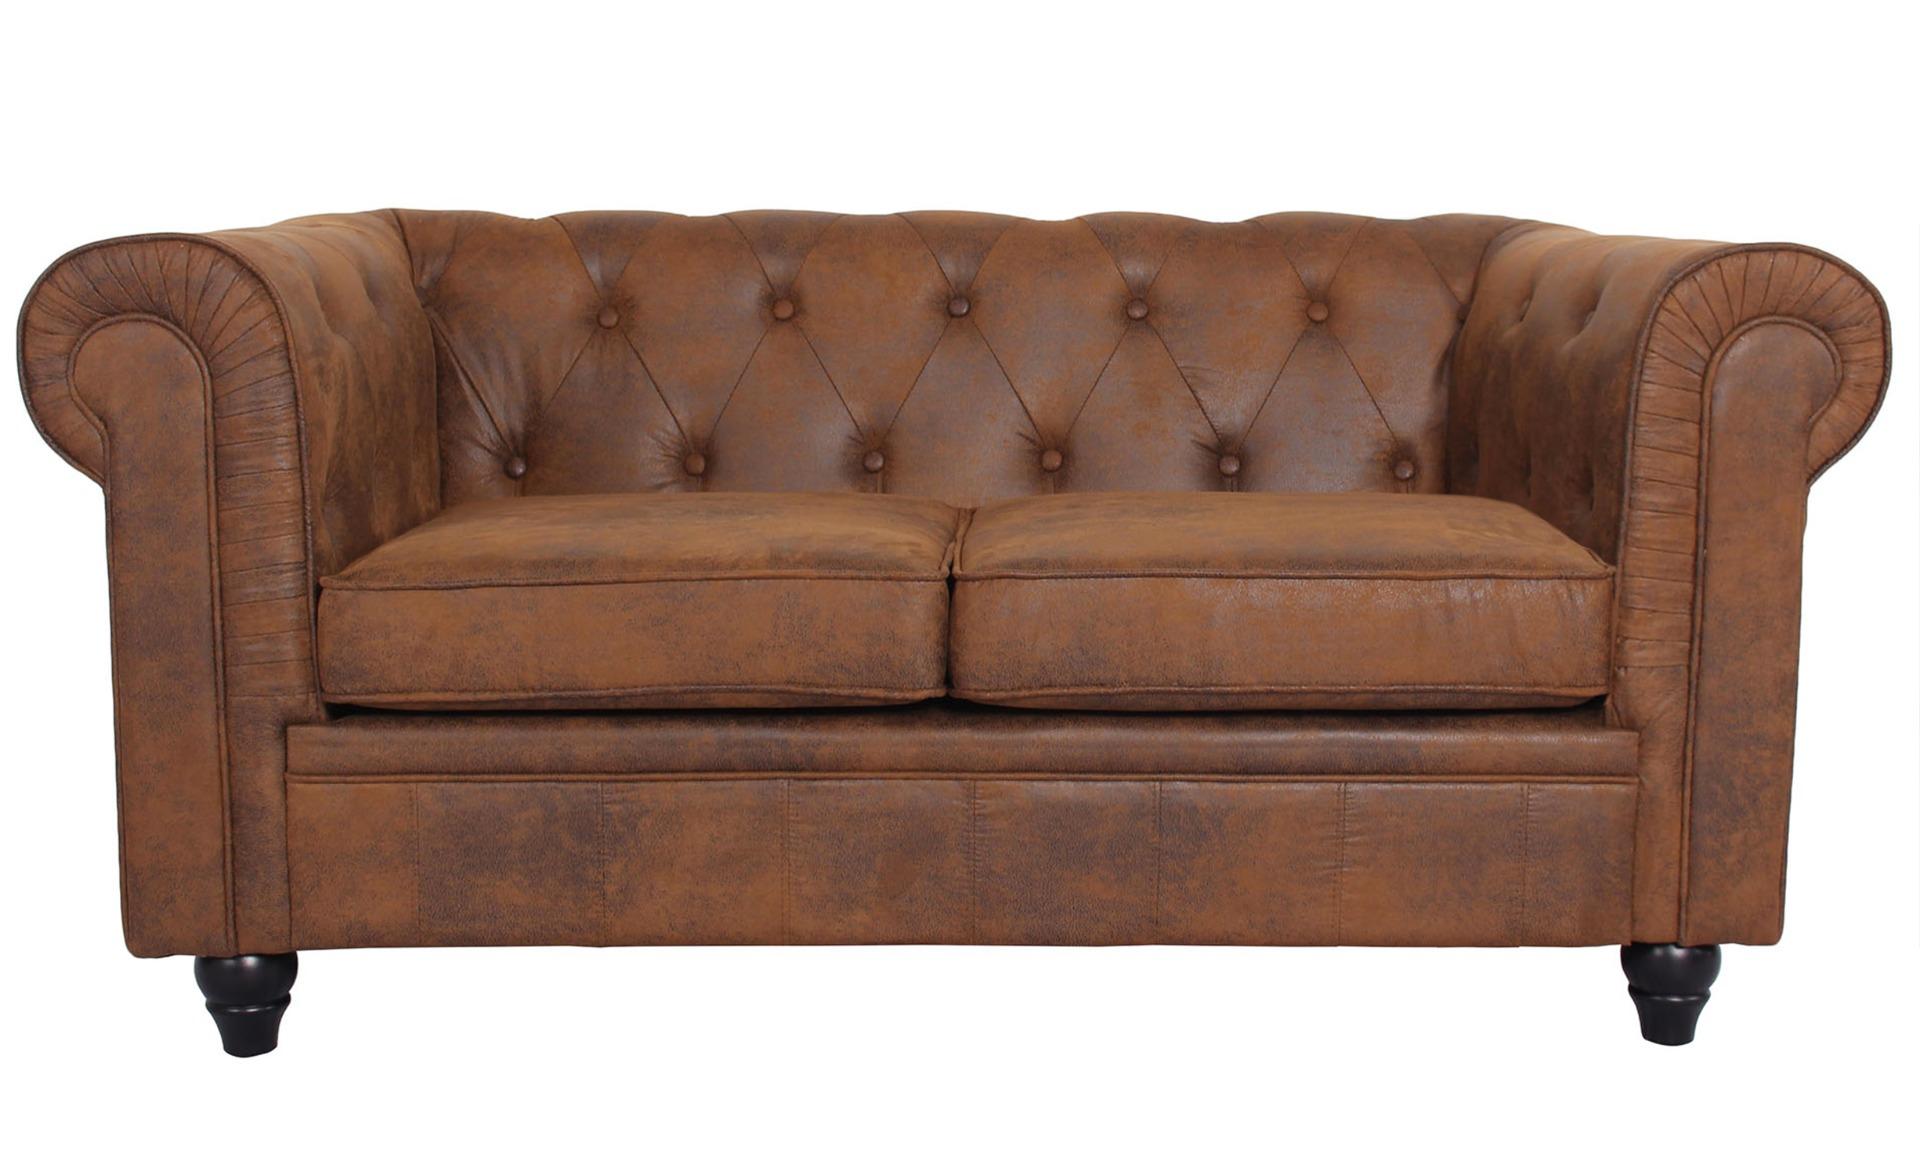 Grand canapé 2 places Chesterfield Vintage